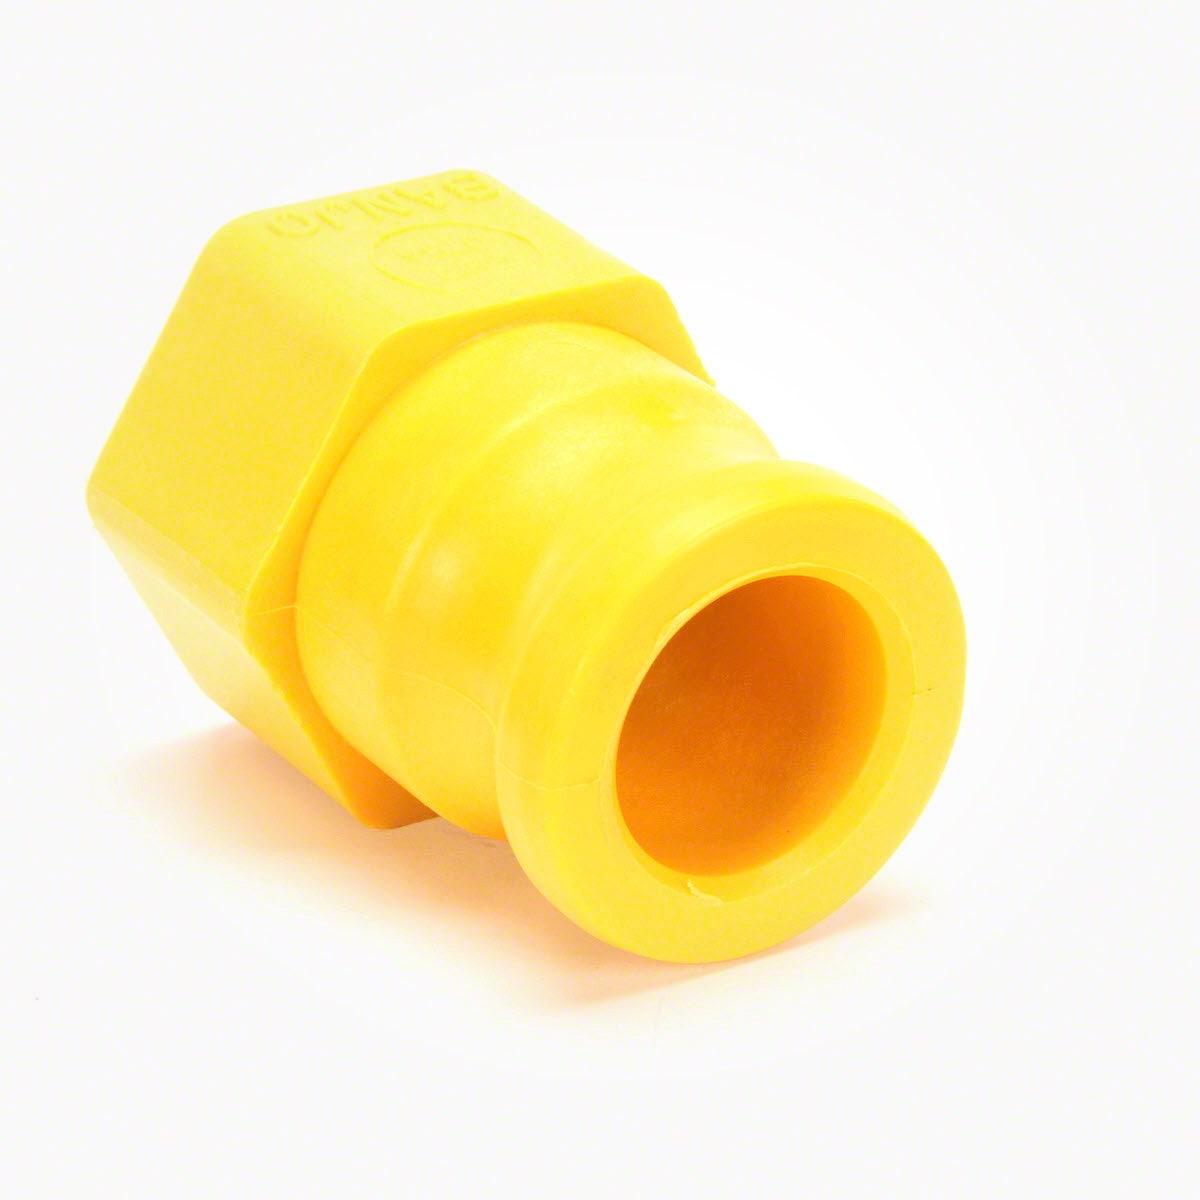 Gh garden hose outlet adapter - Banjo Garden Hose Thread Fitting Adapter X Female Gh